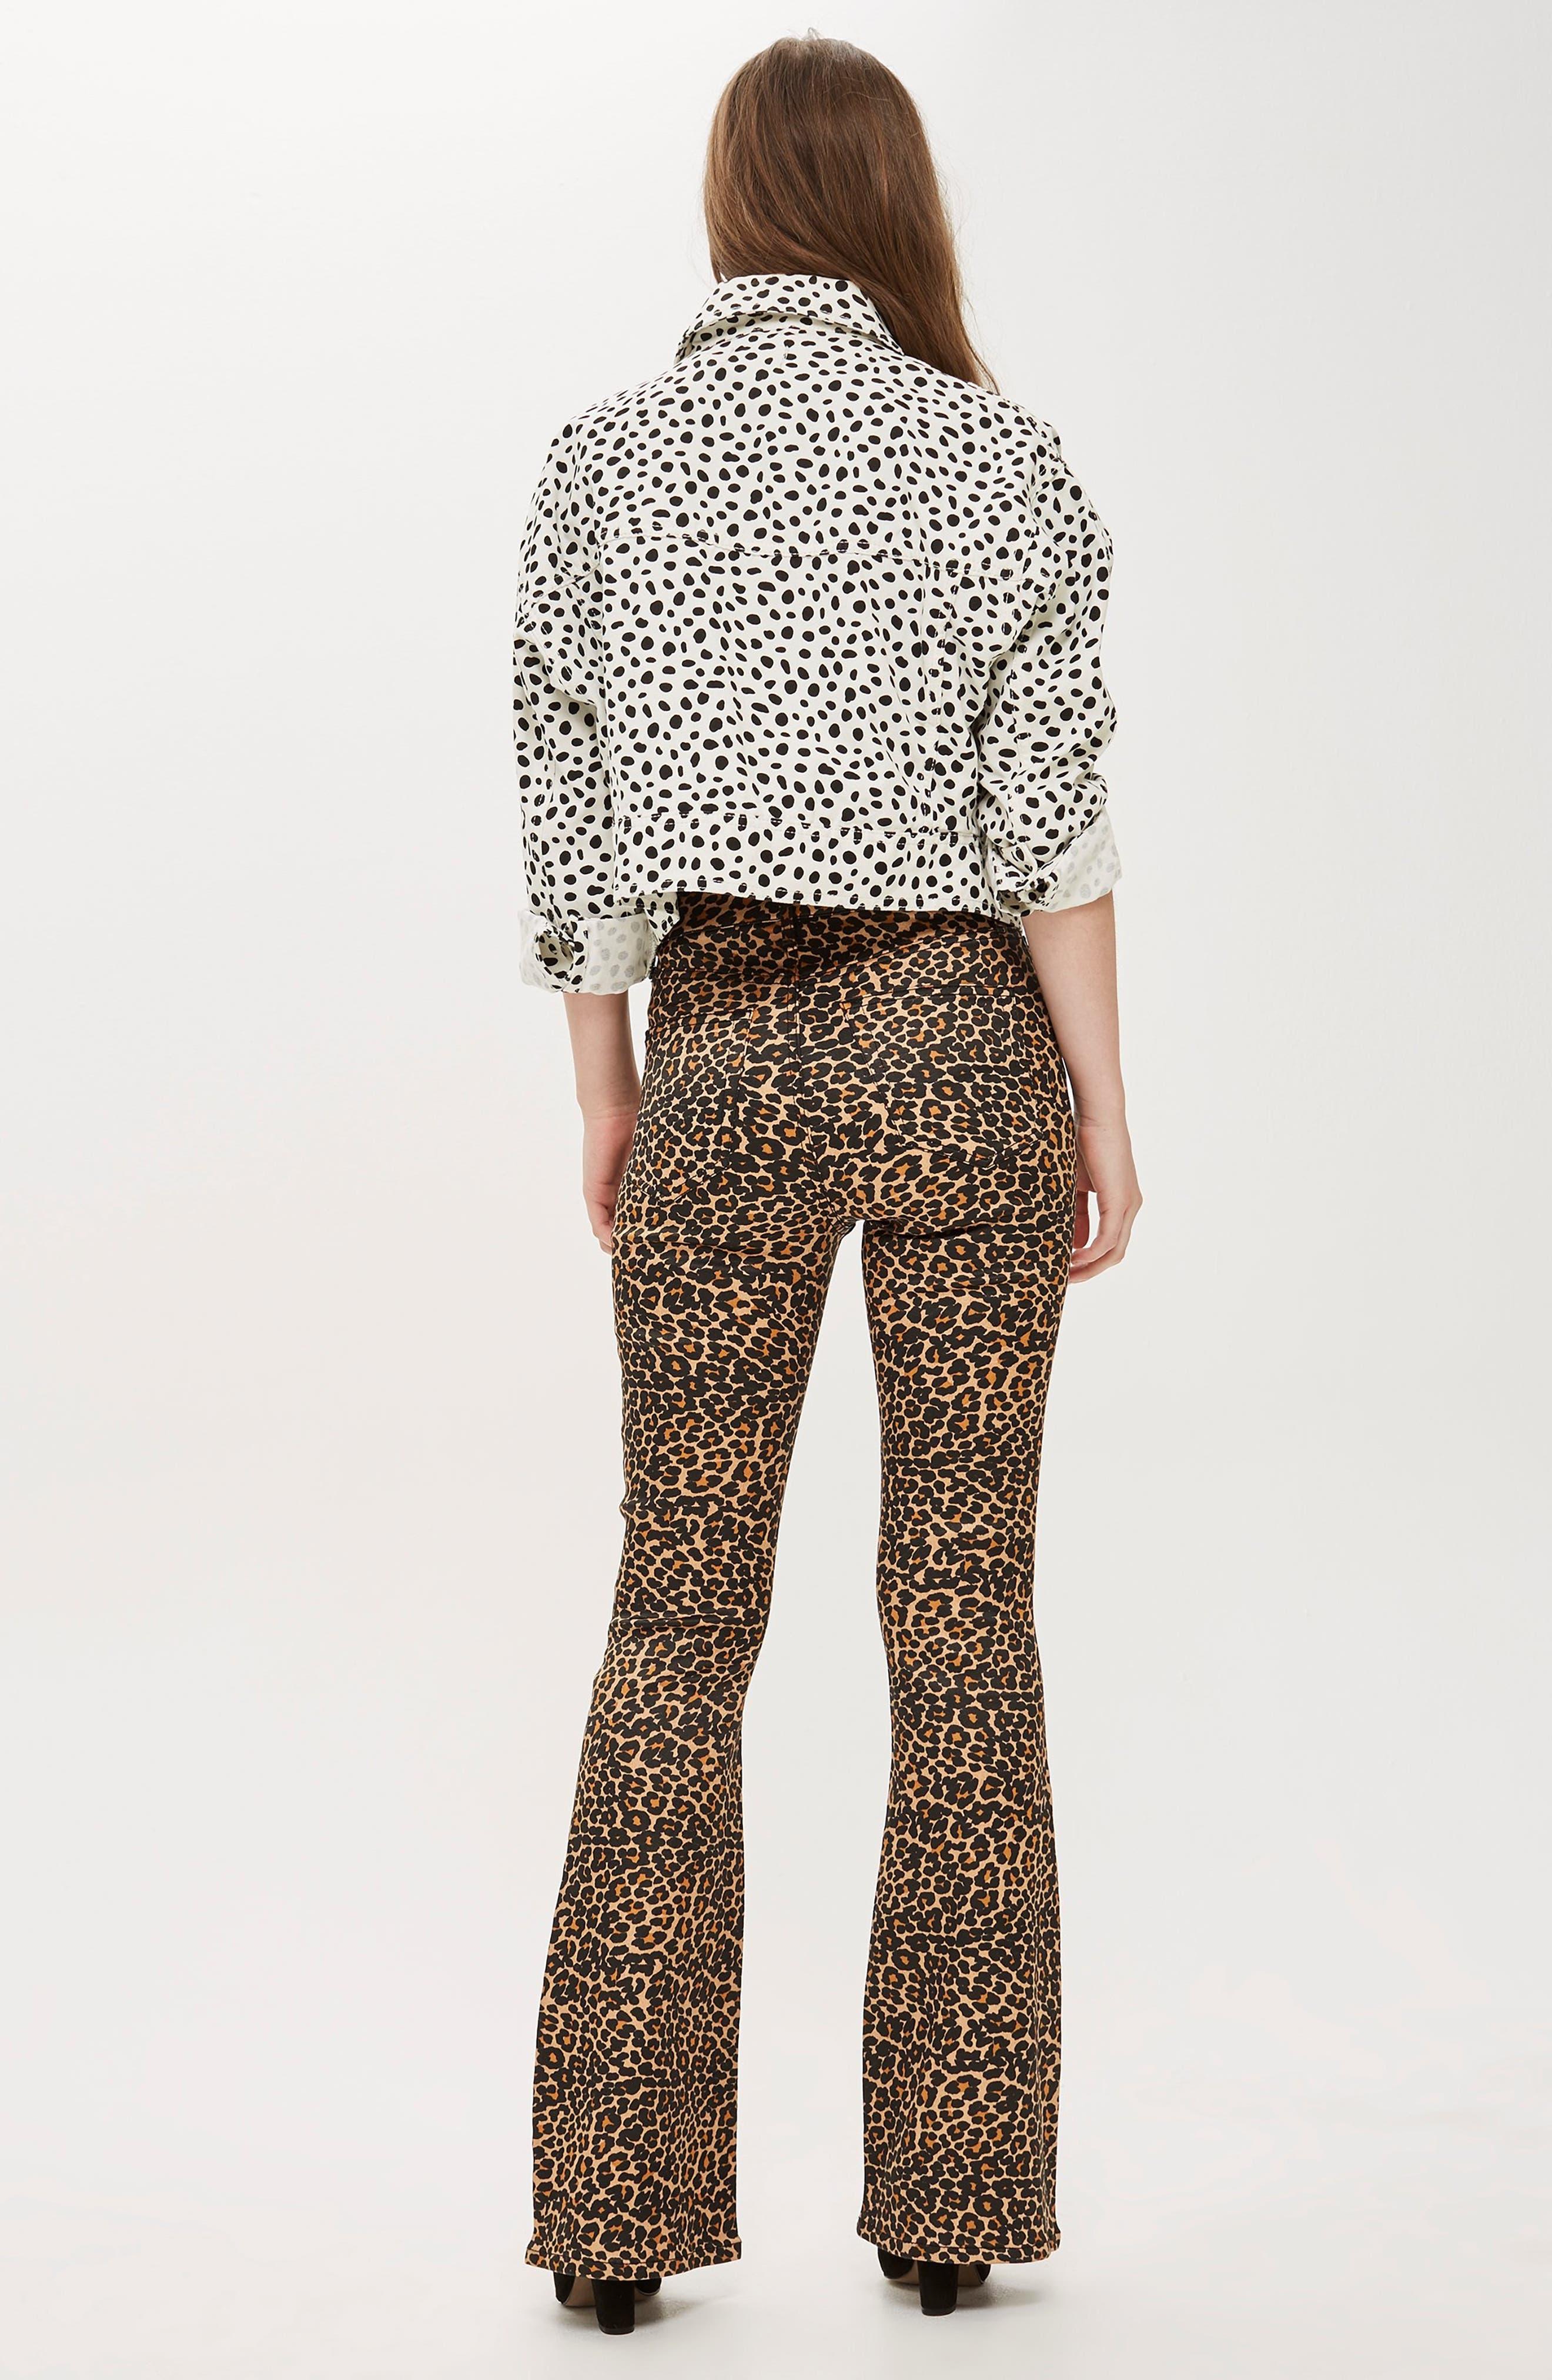 TOPSHOP, MOTO Leopard Print Flare Jeans, Alternate thumbnail 5, color, 200